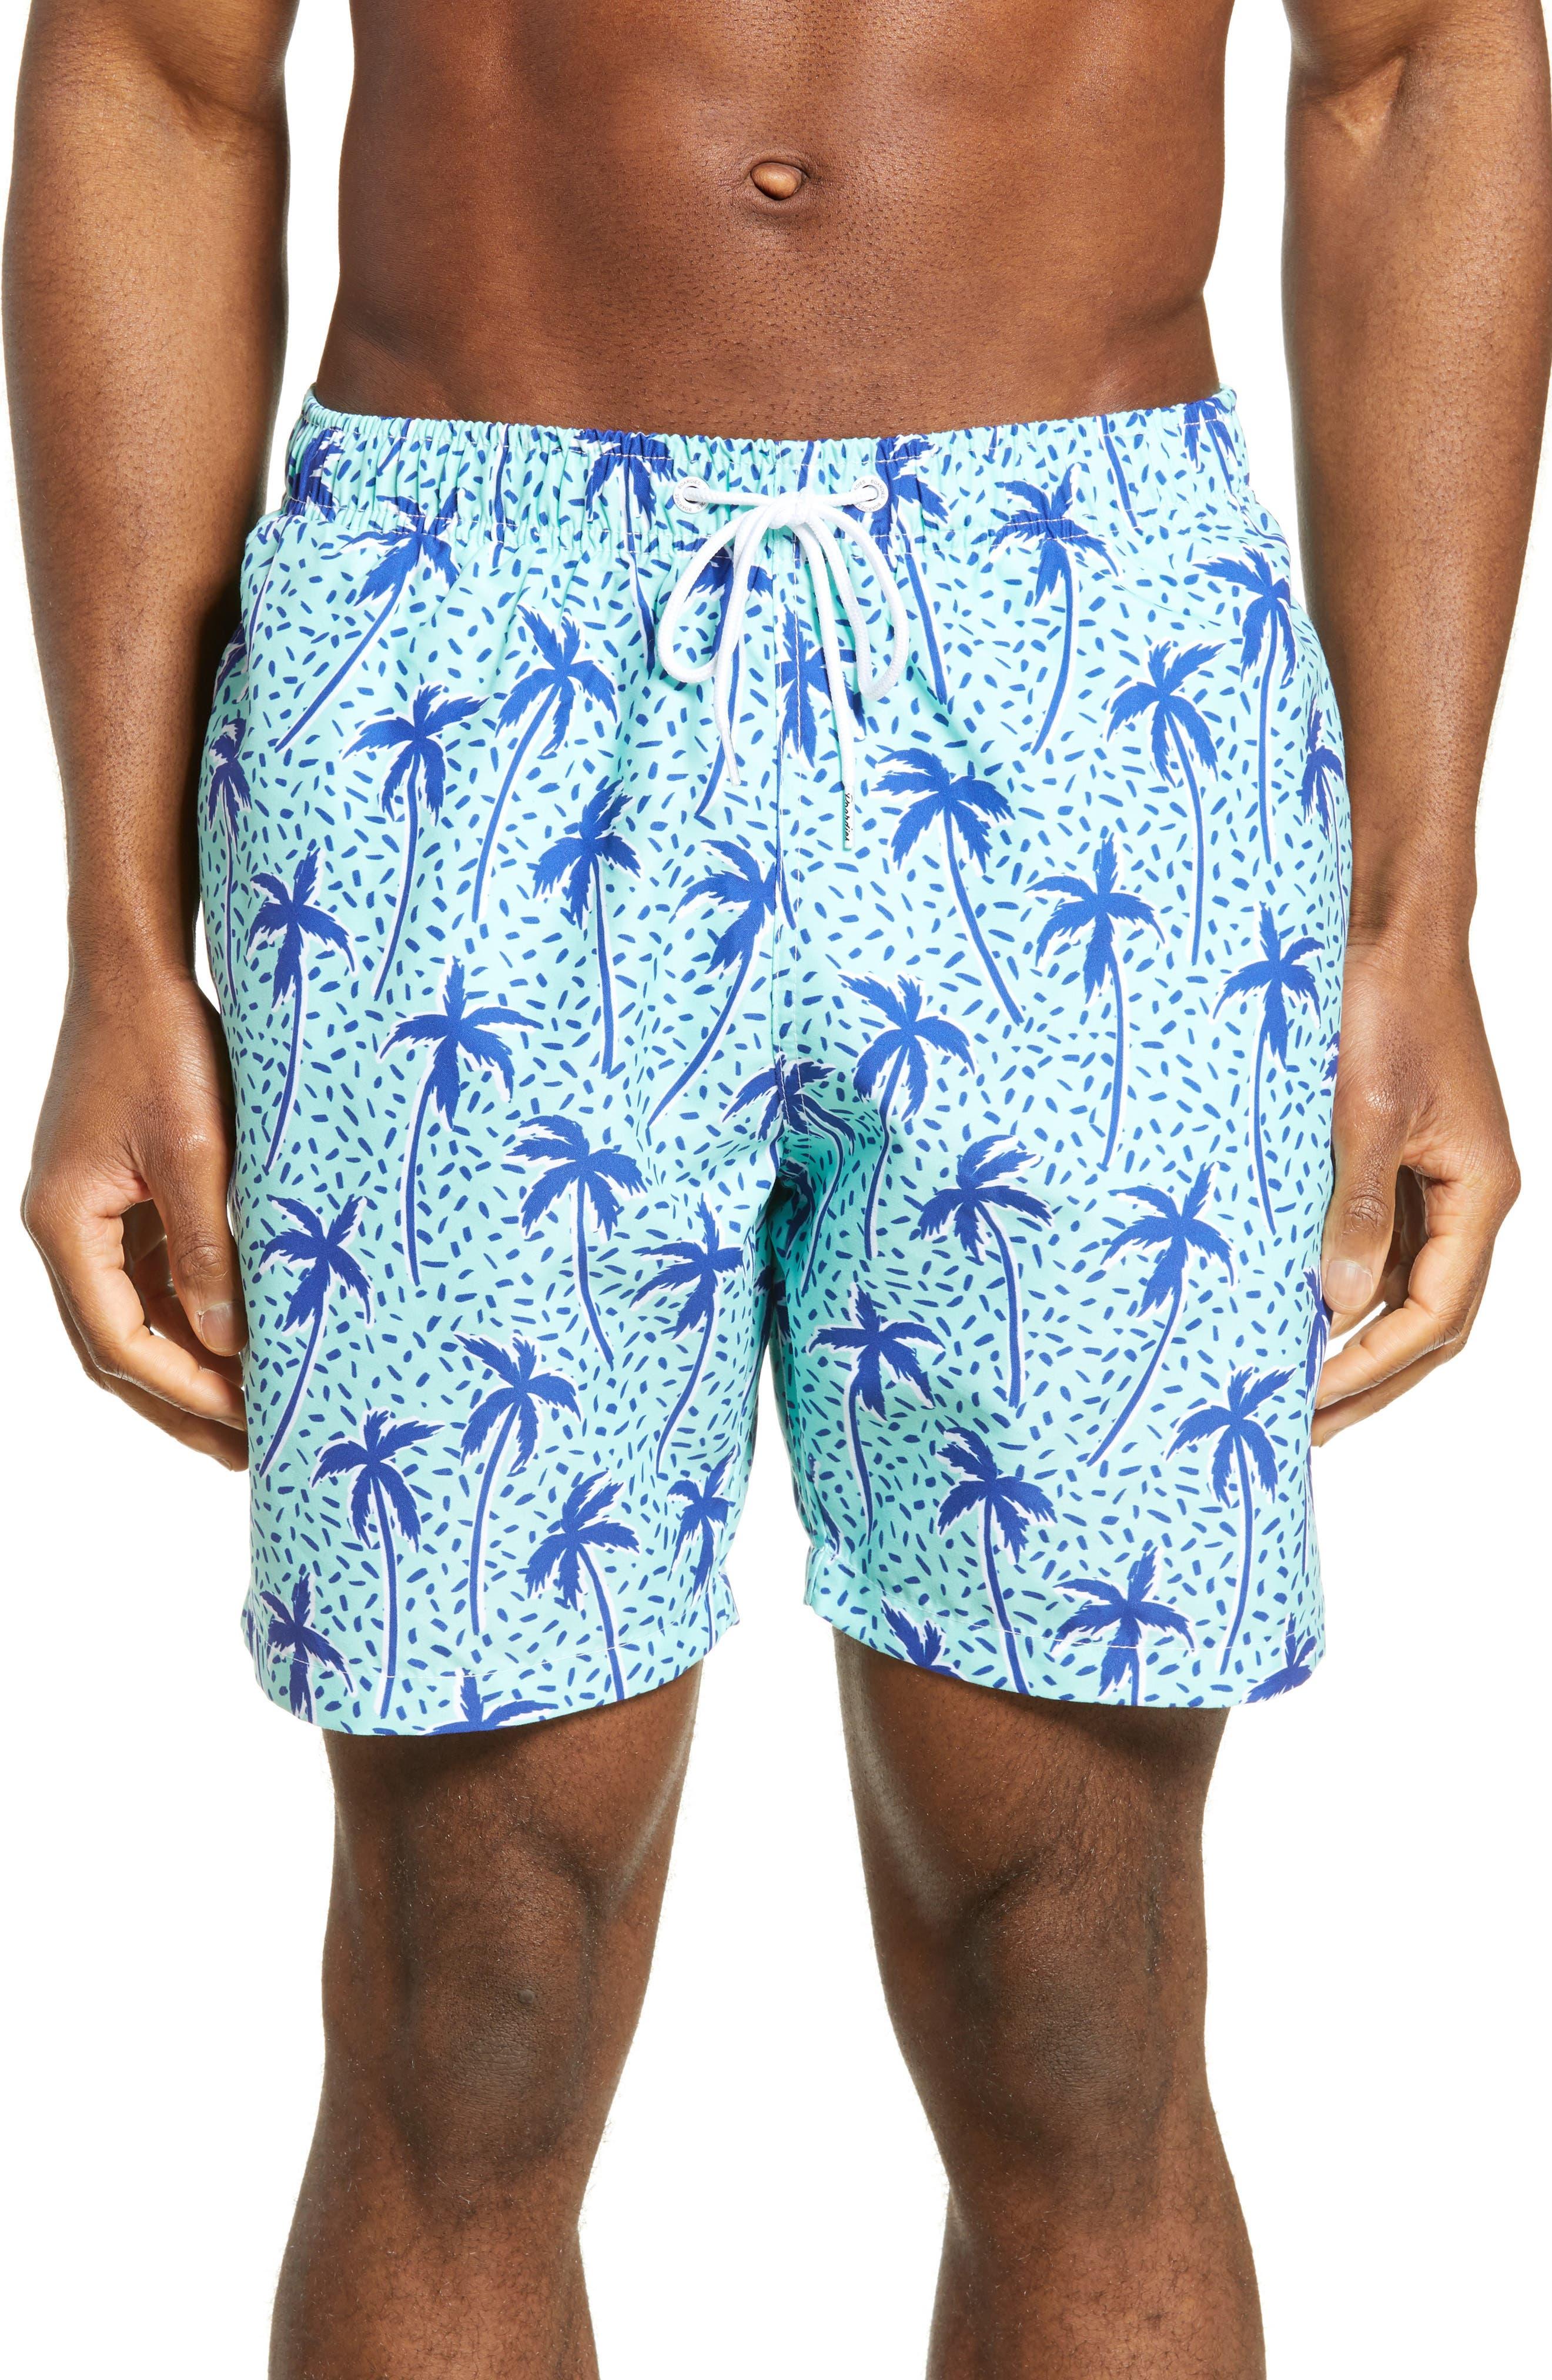 Boardies Flair Palm Print Swim Trunks, Blue/green